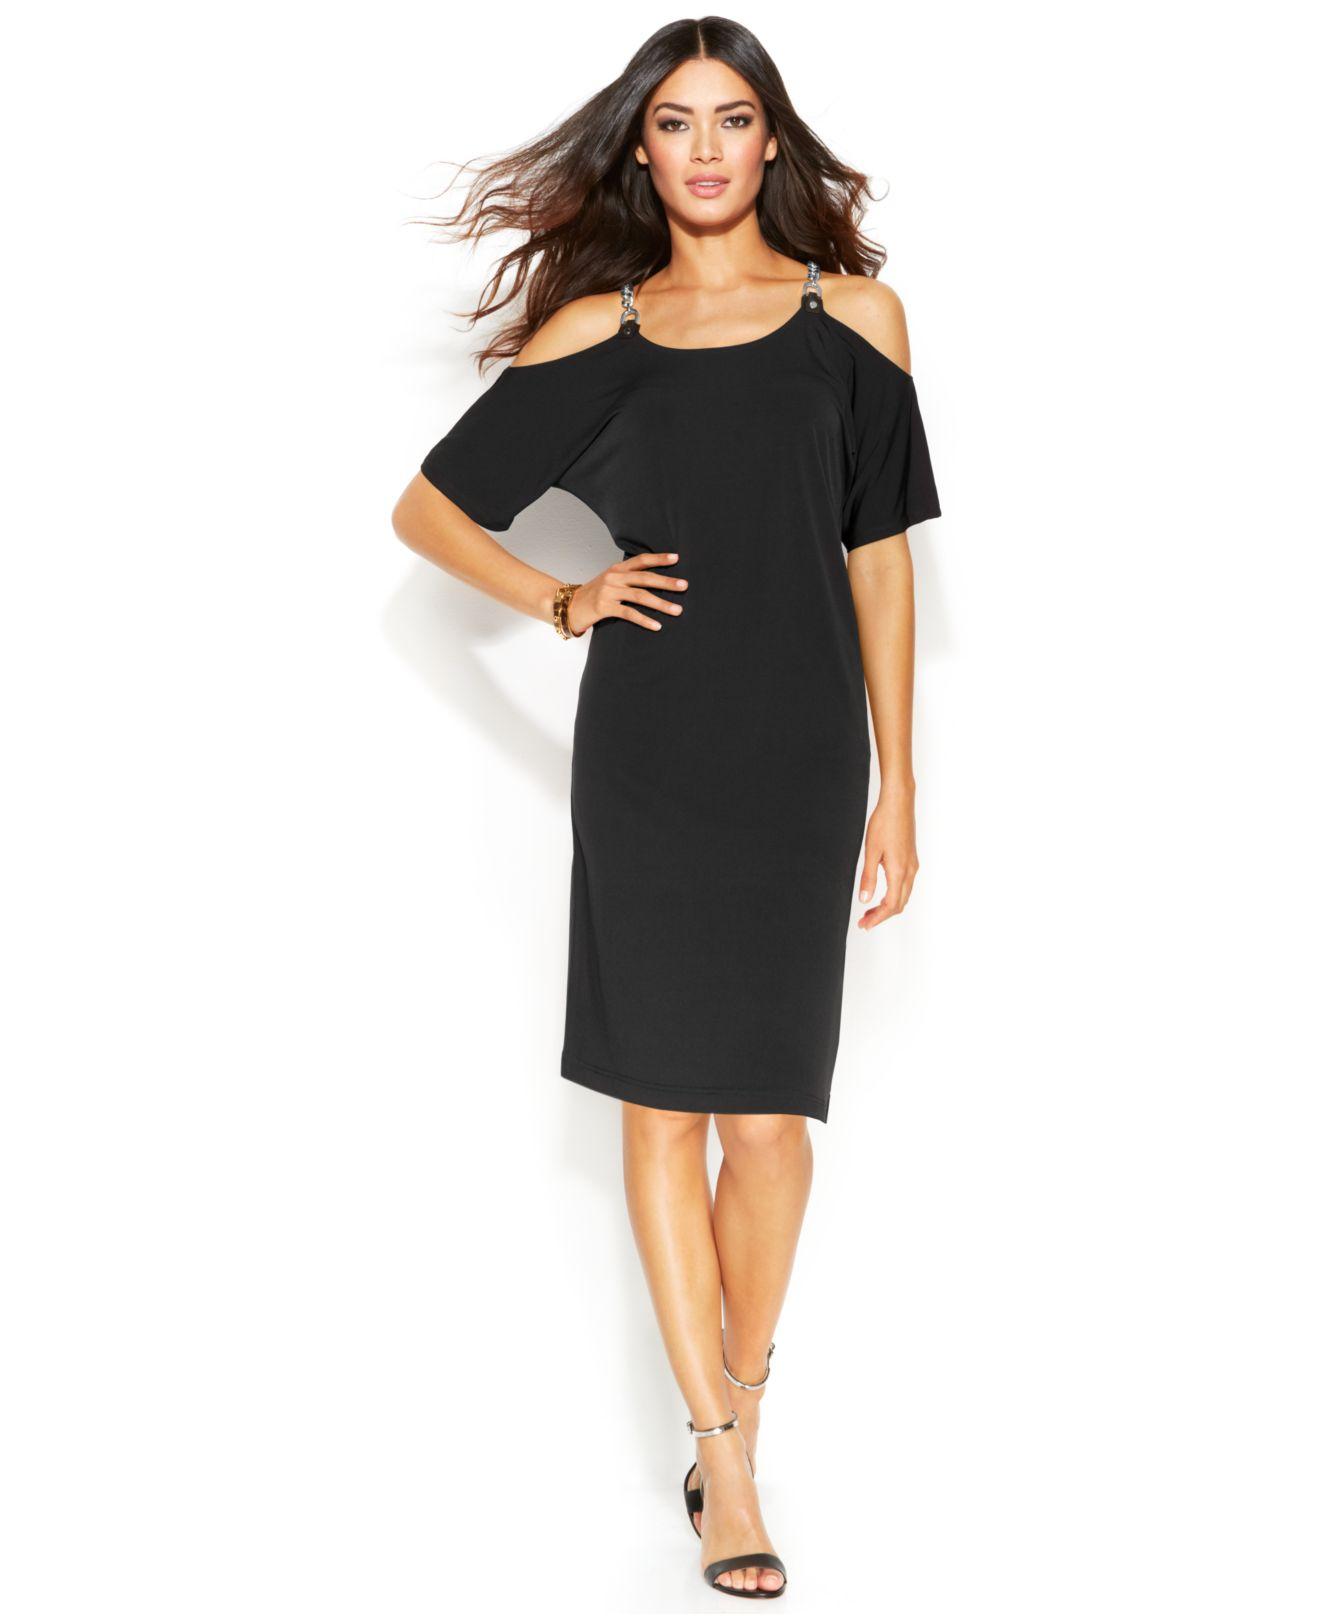 Fashion style Kors michael dress for lady